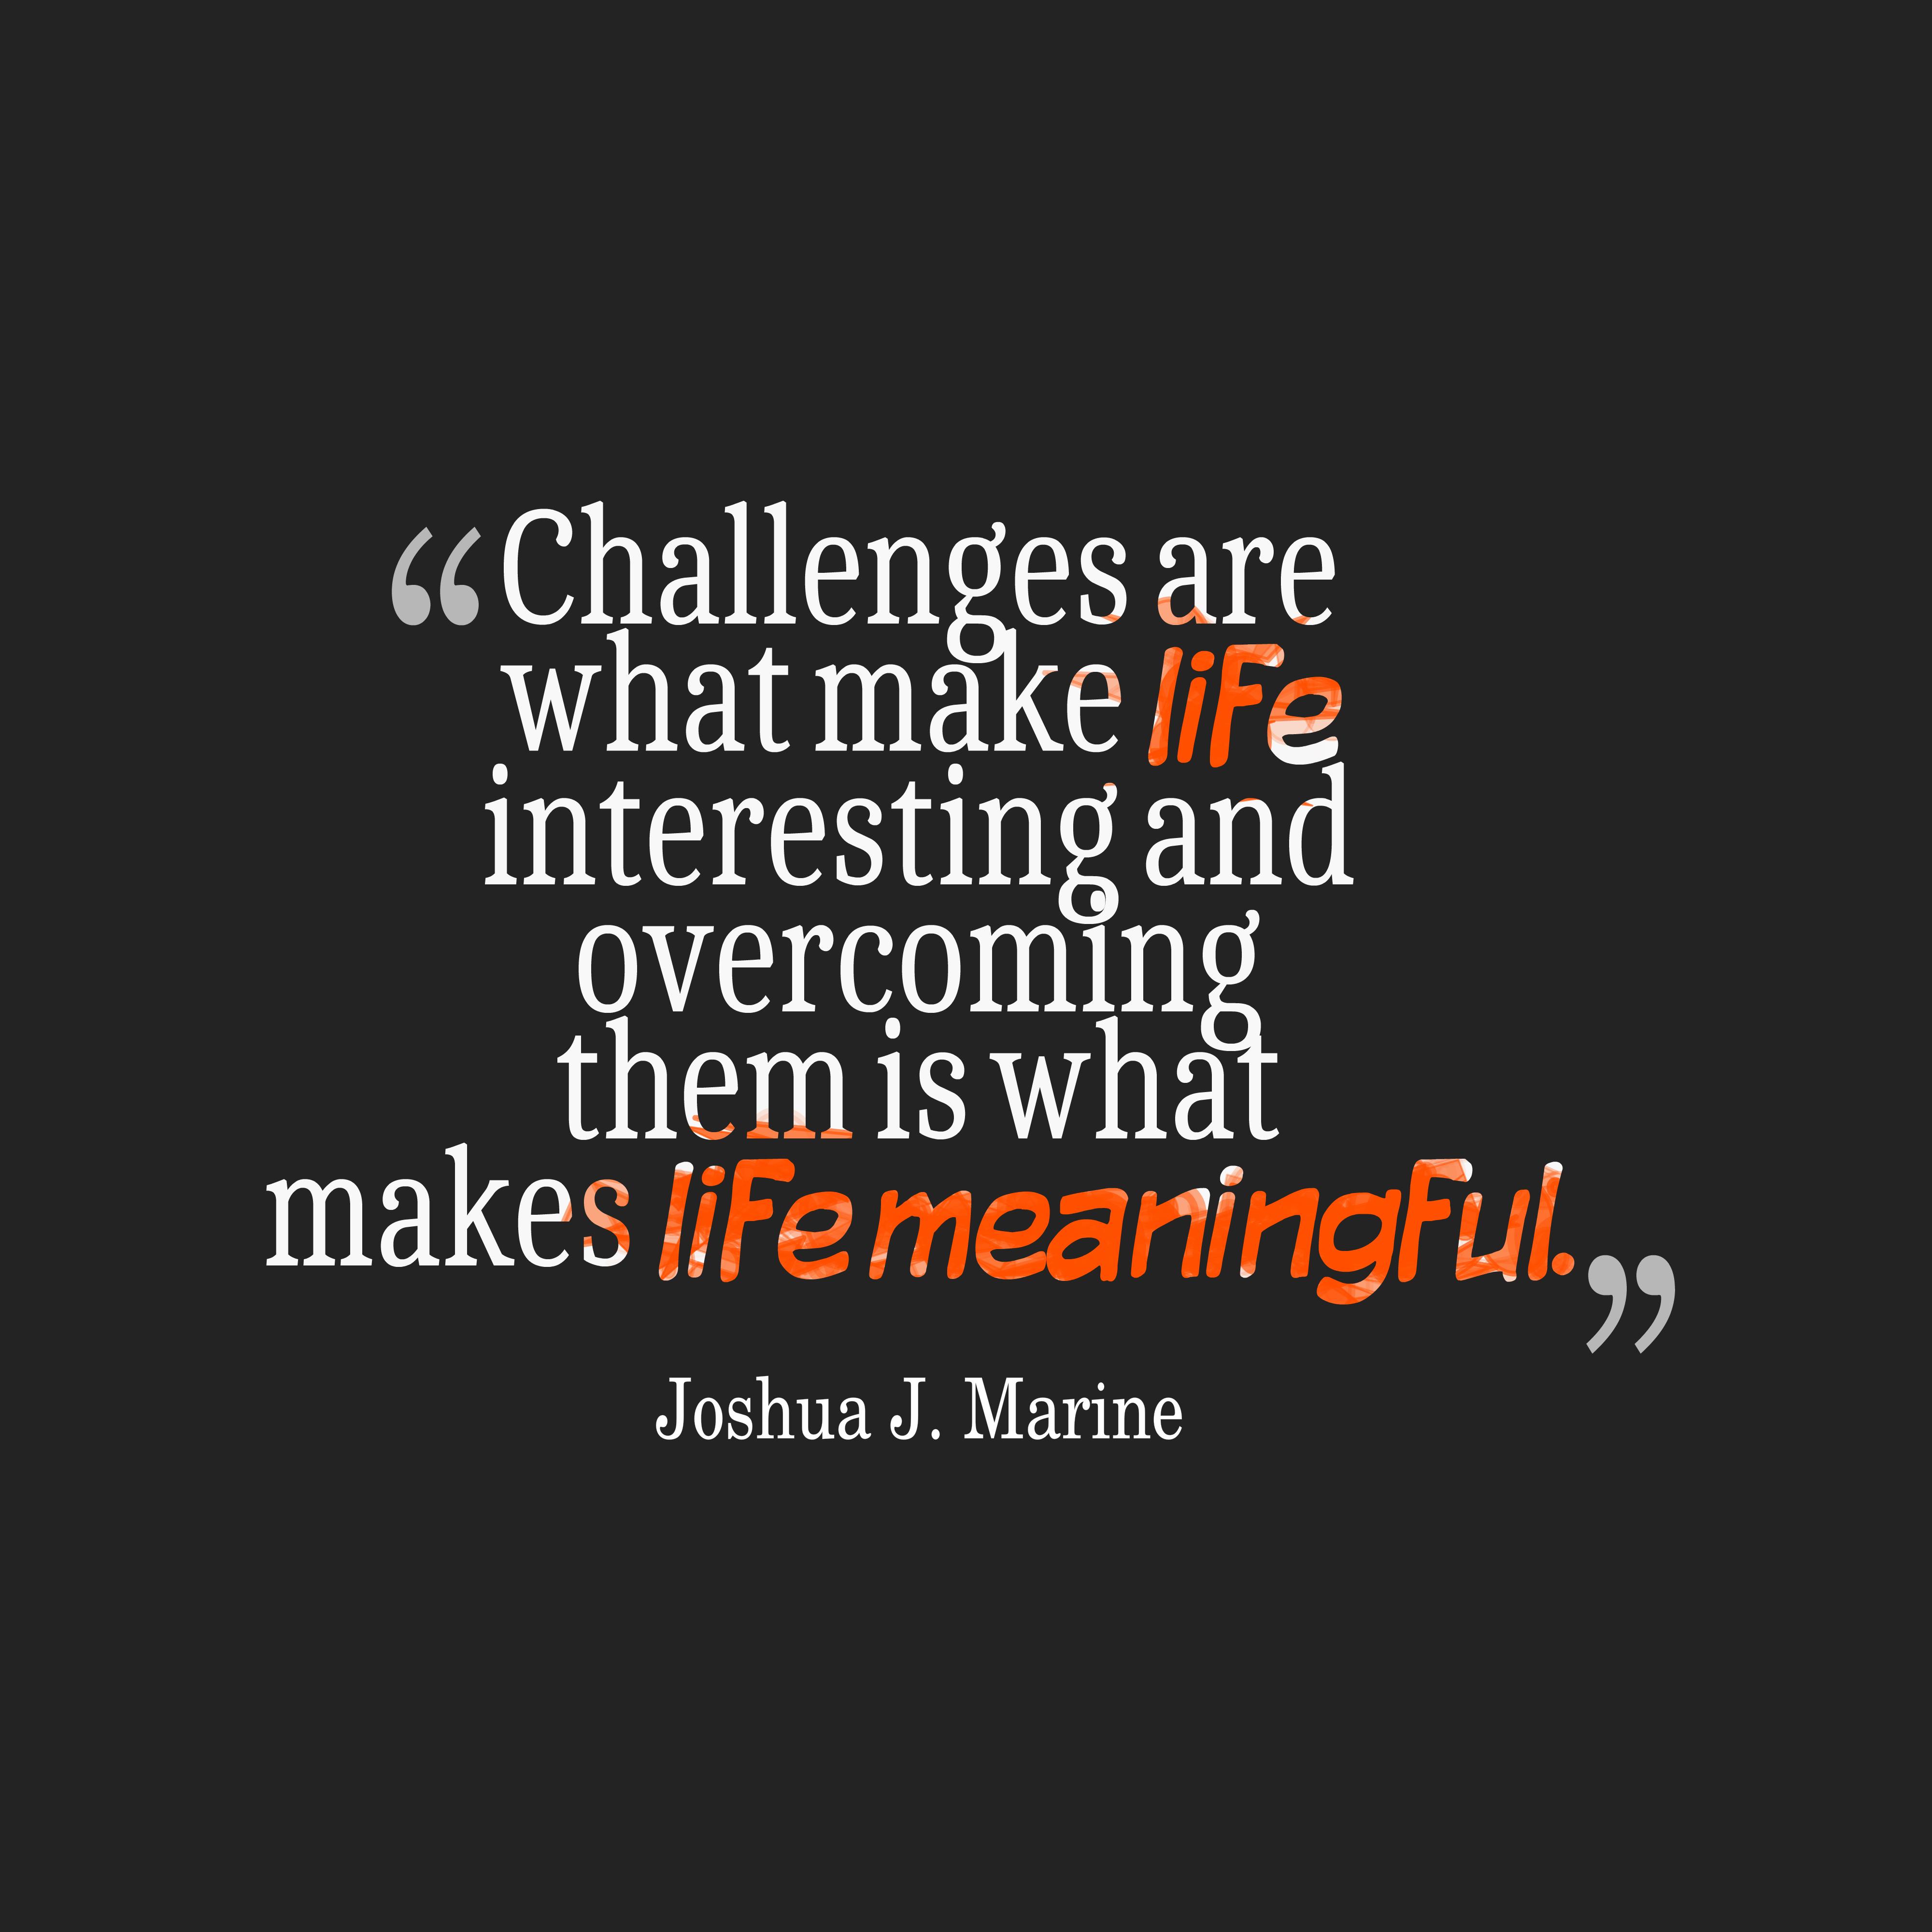 Life Challenges Quotes Challengesarewhatmakelife__Quotesbyjoshuaj.marine35